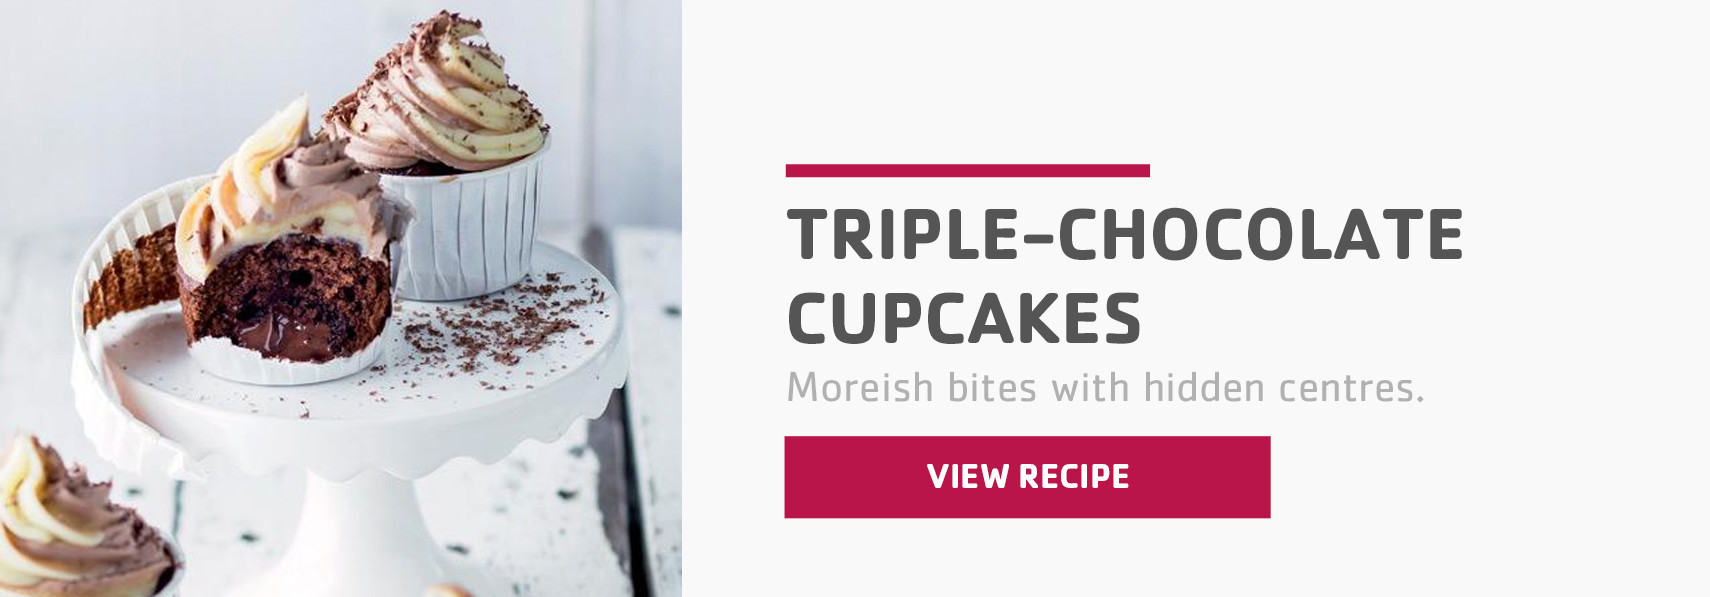 triplechocolate-cupcakes.jpg